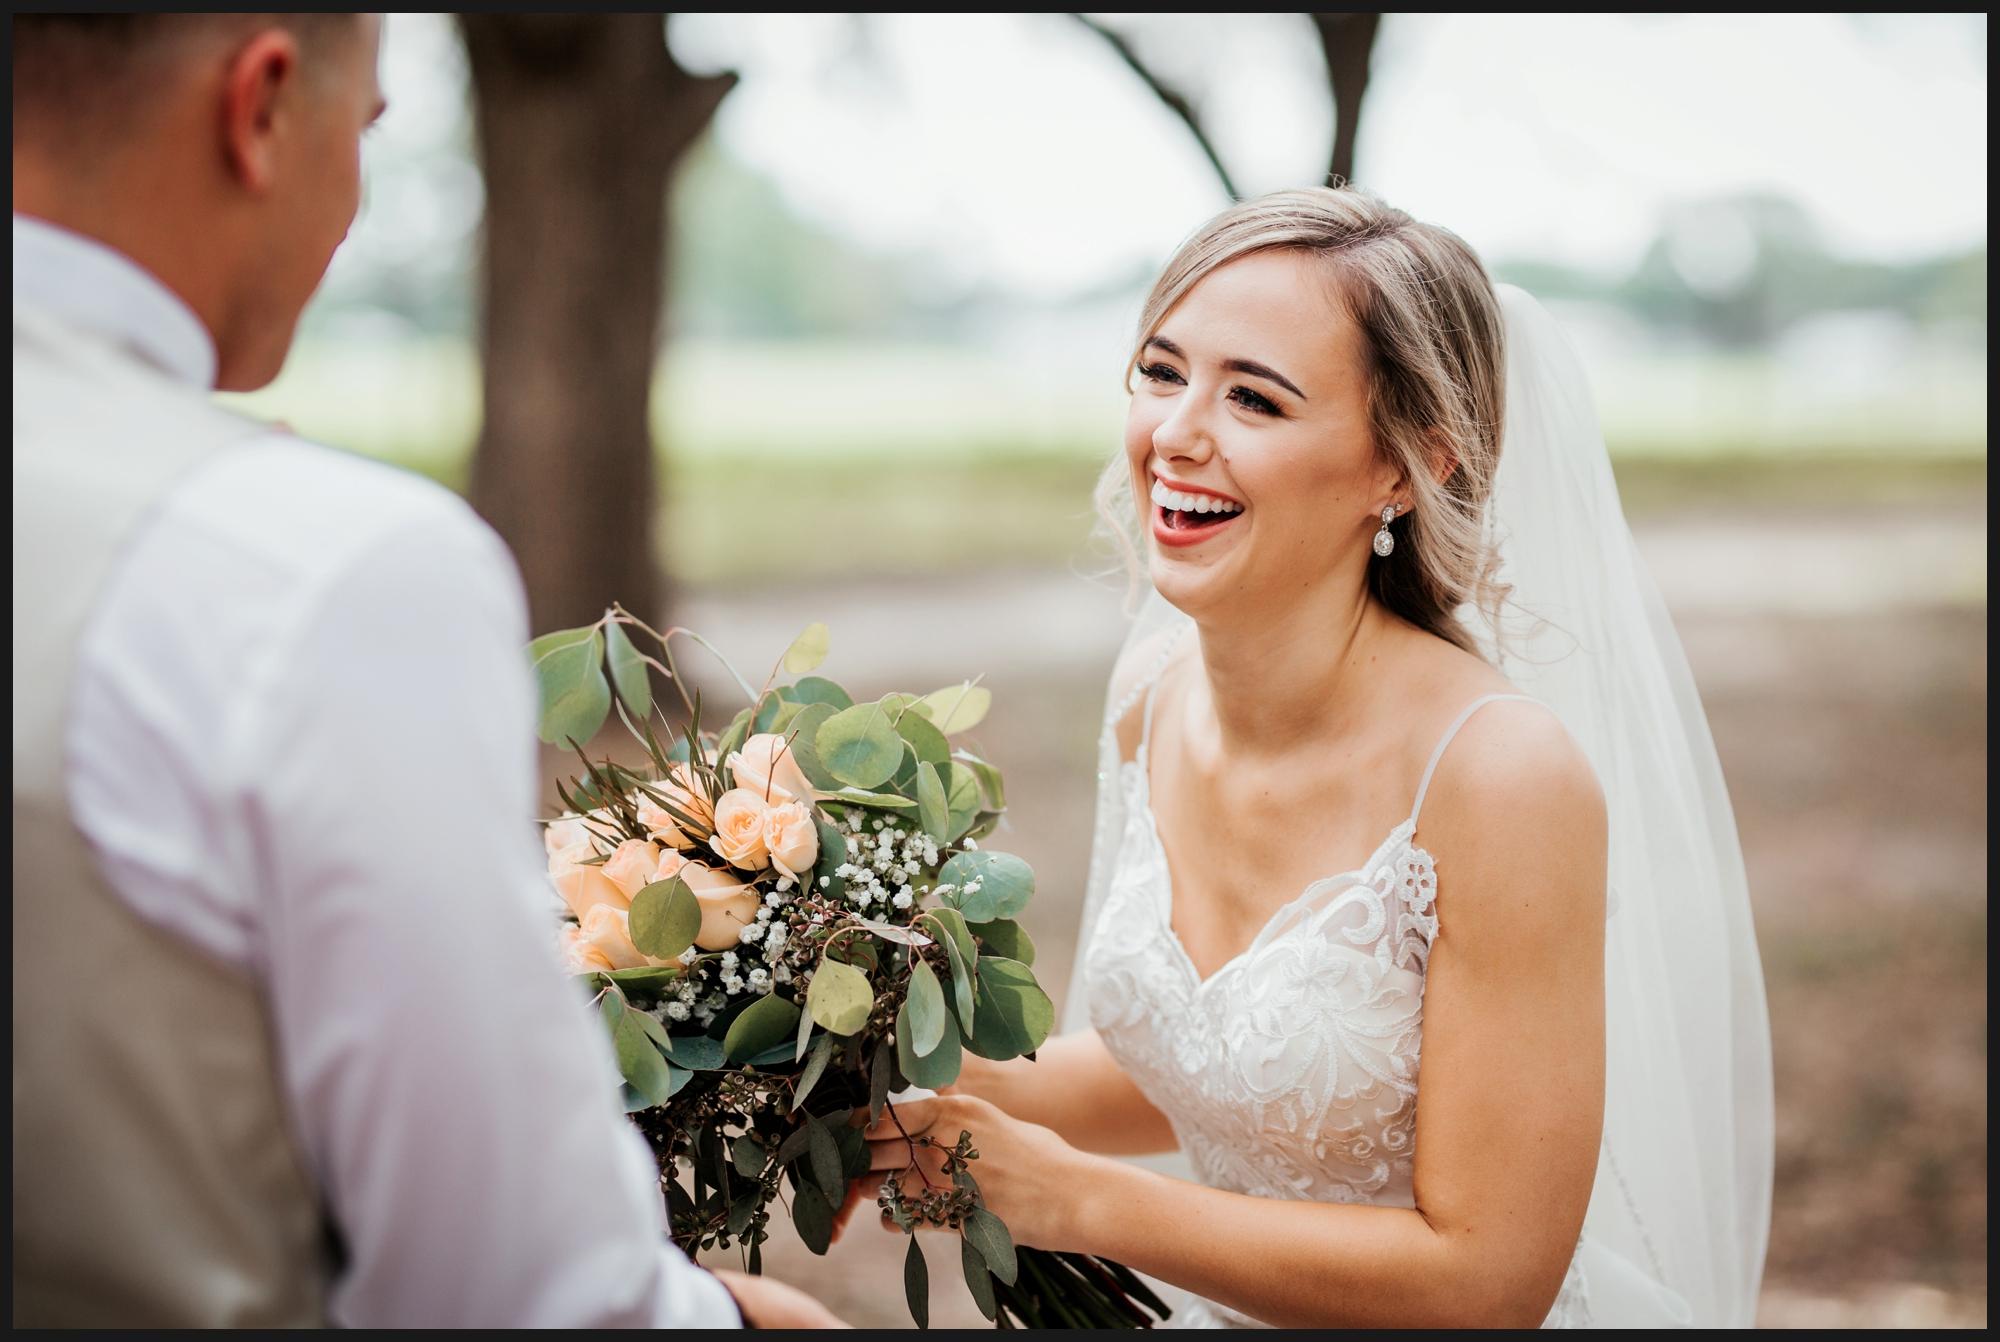 Orlando-Wedding-Photographer-destination-wedding-photographer-florida-wedding-photographer-hawaii-wedding-photographer_0293.jpg